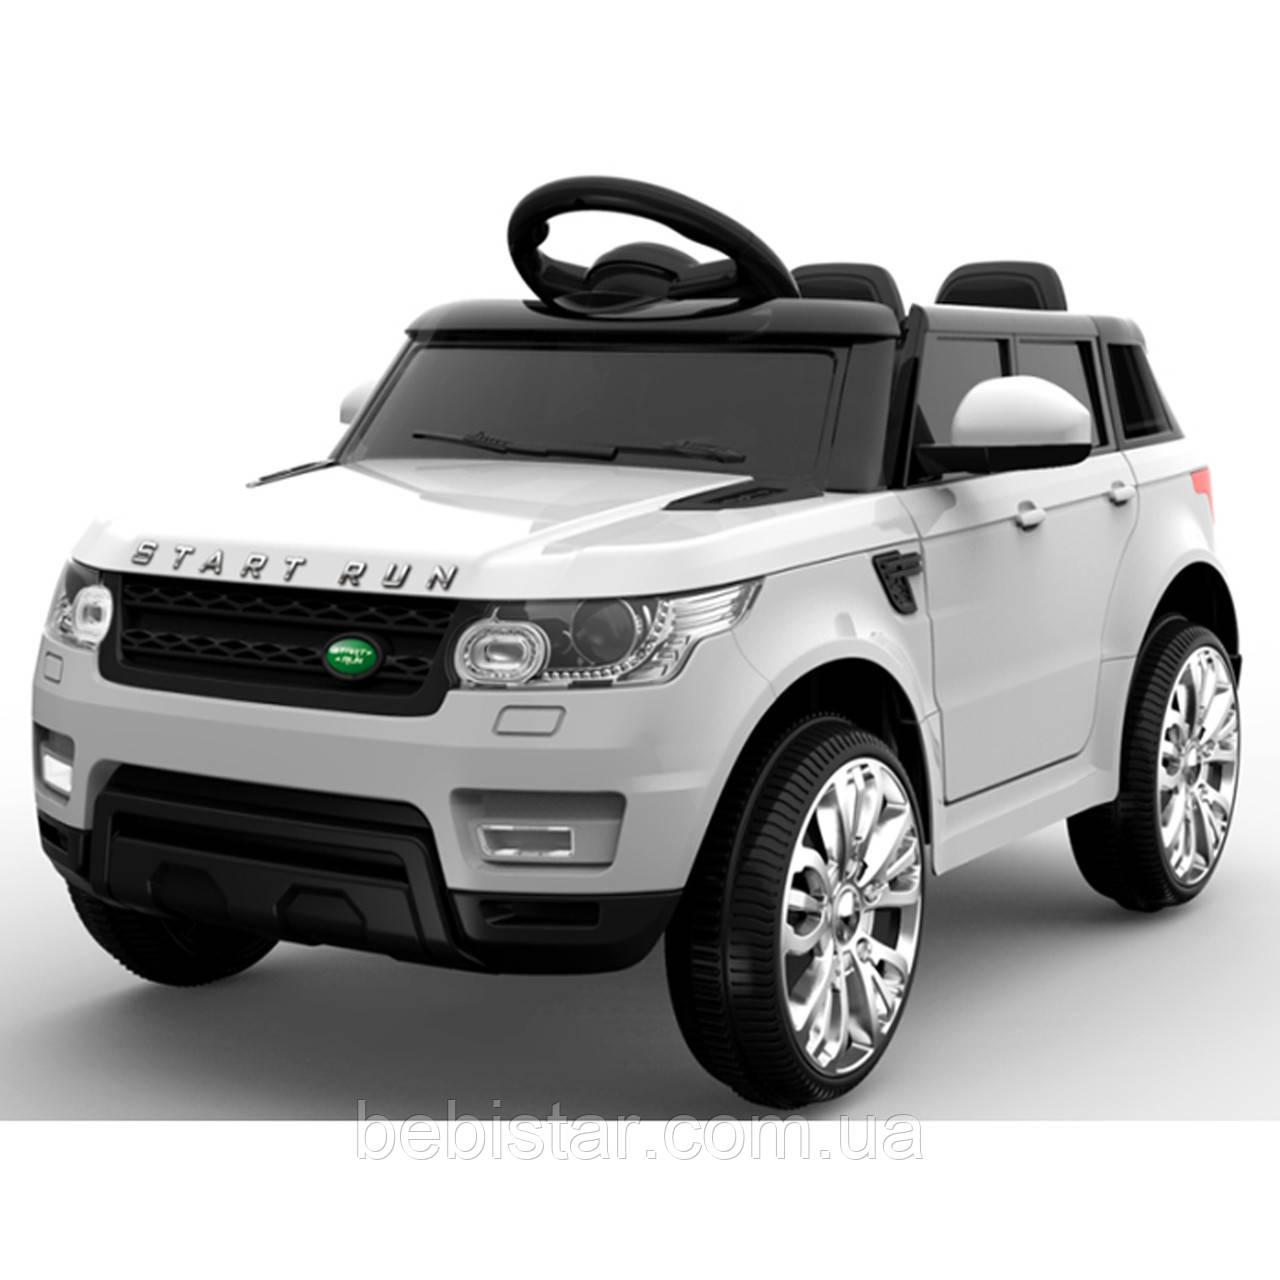 Детский электромобиль FL1638 EVA WHITE деткам 3-8 лет